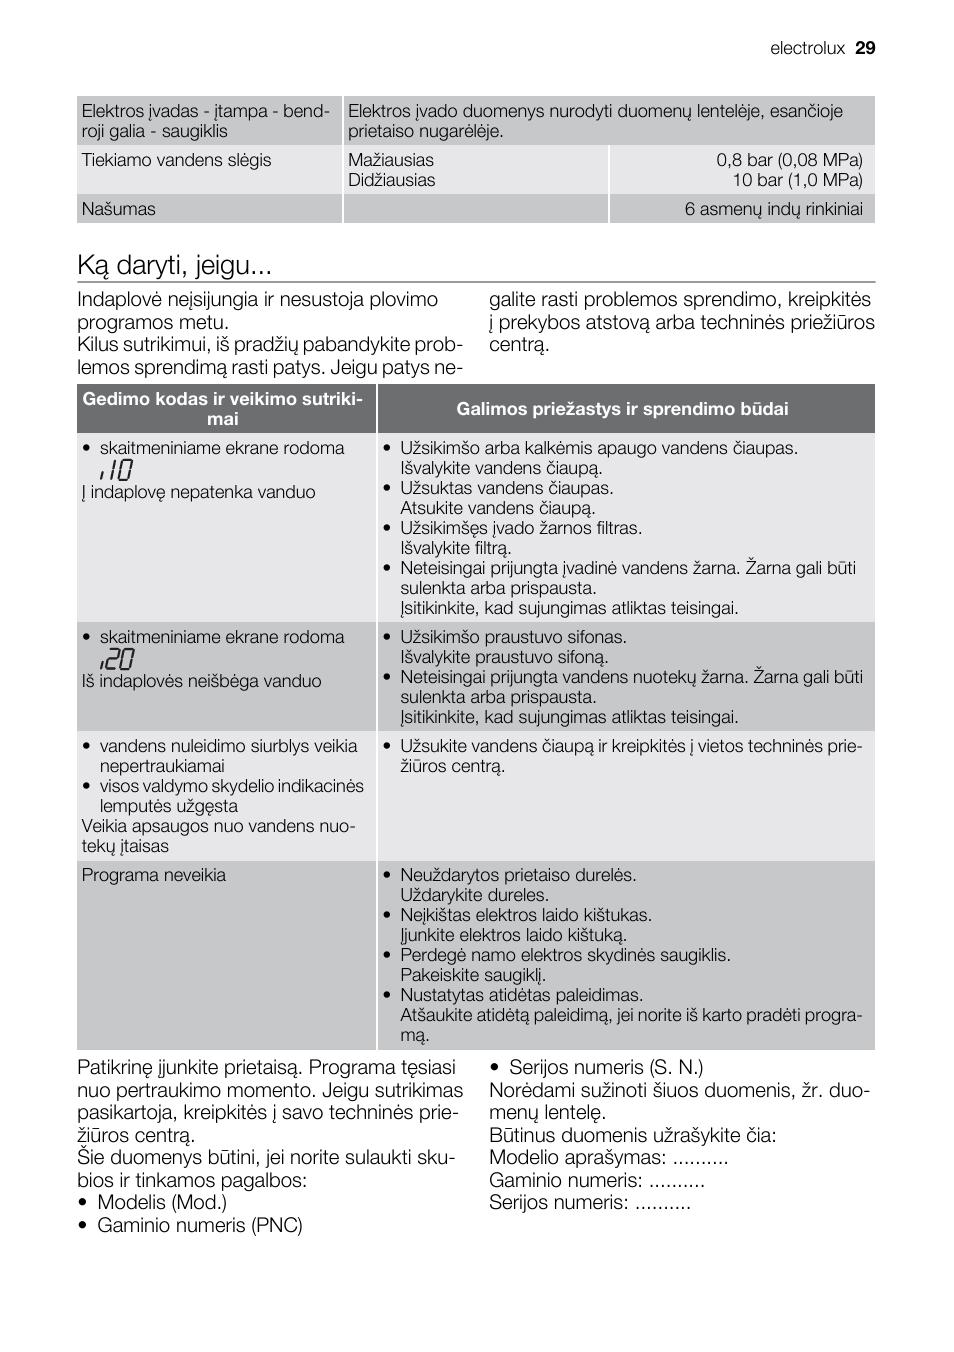 Electrolux Esf 2450 W Инструкция